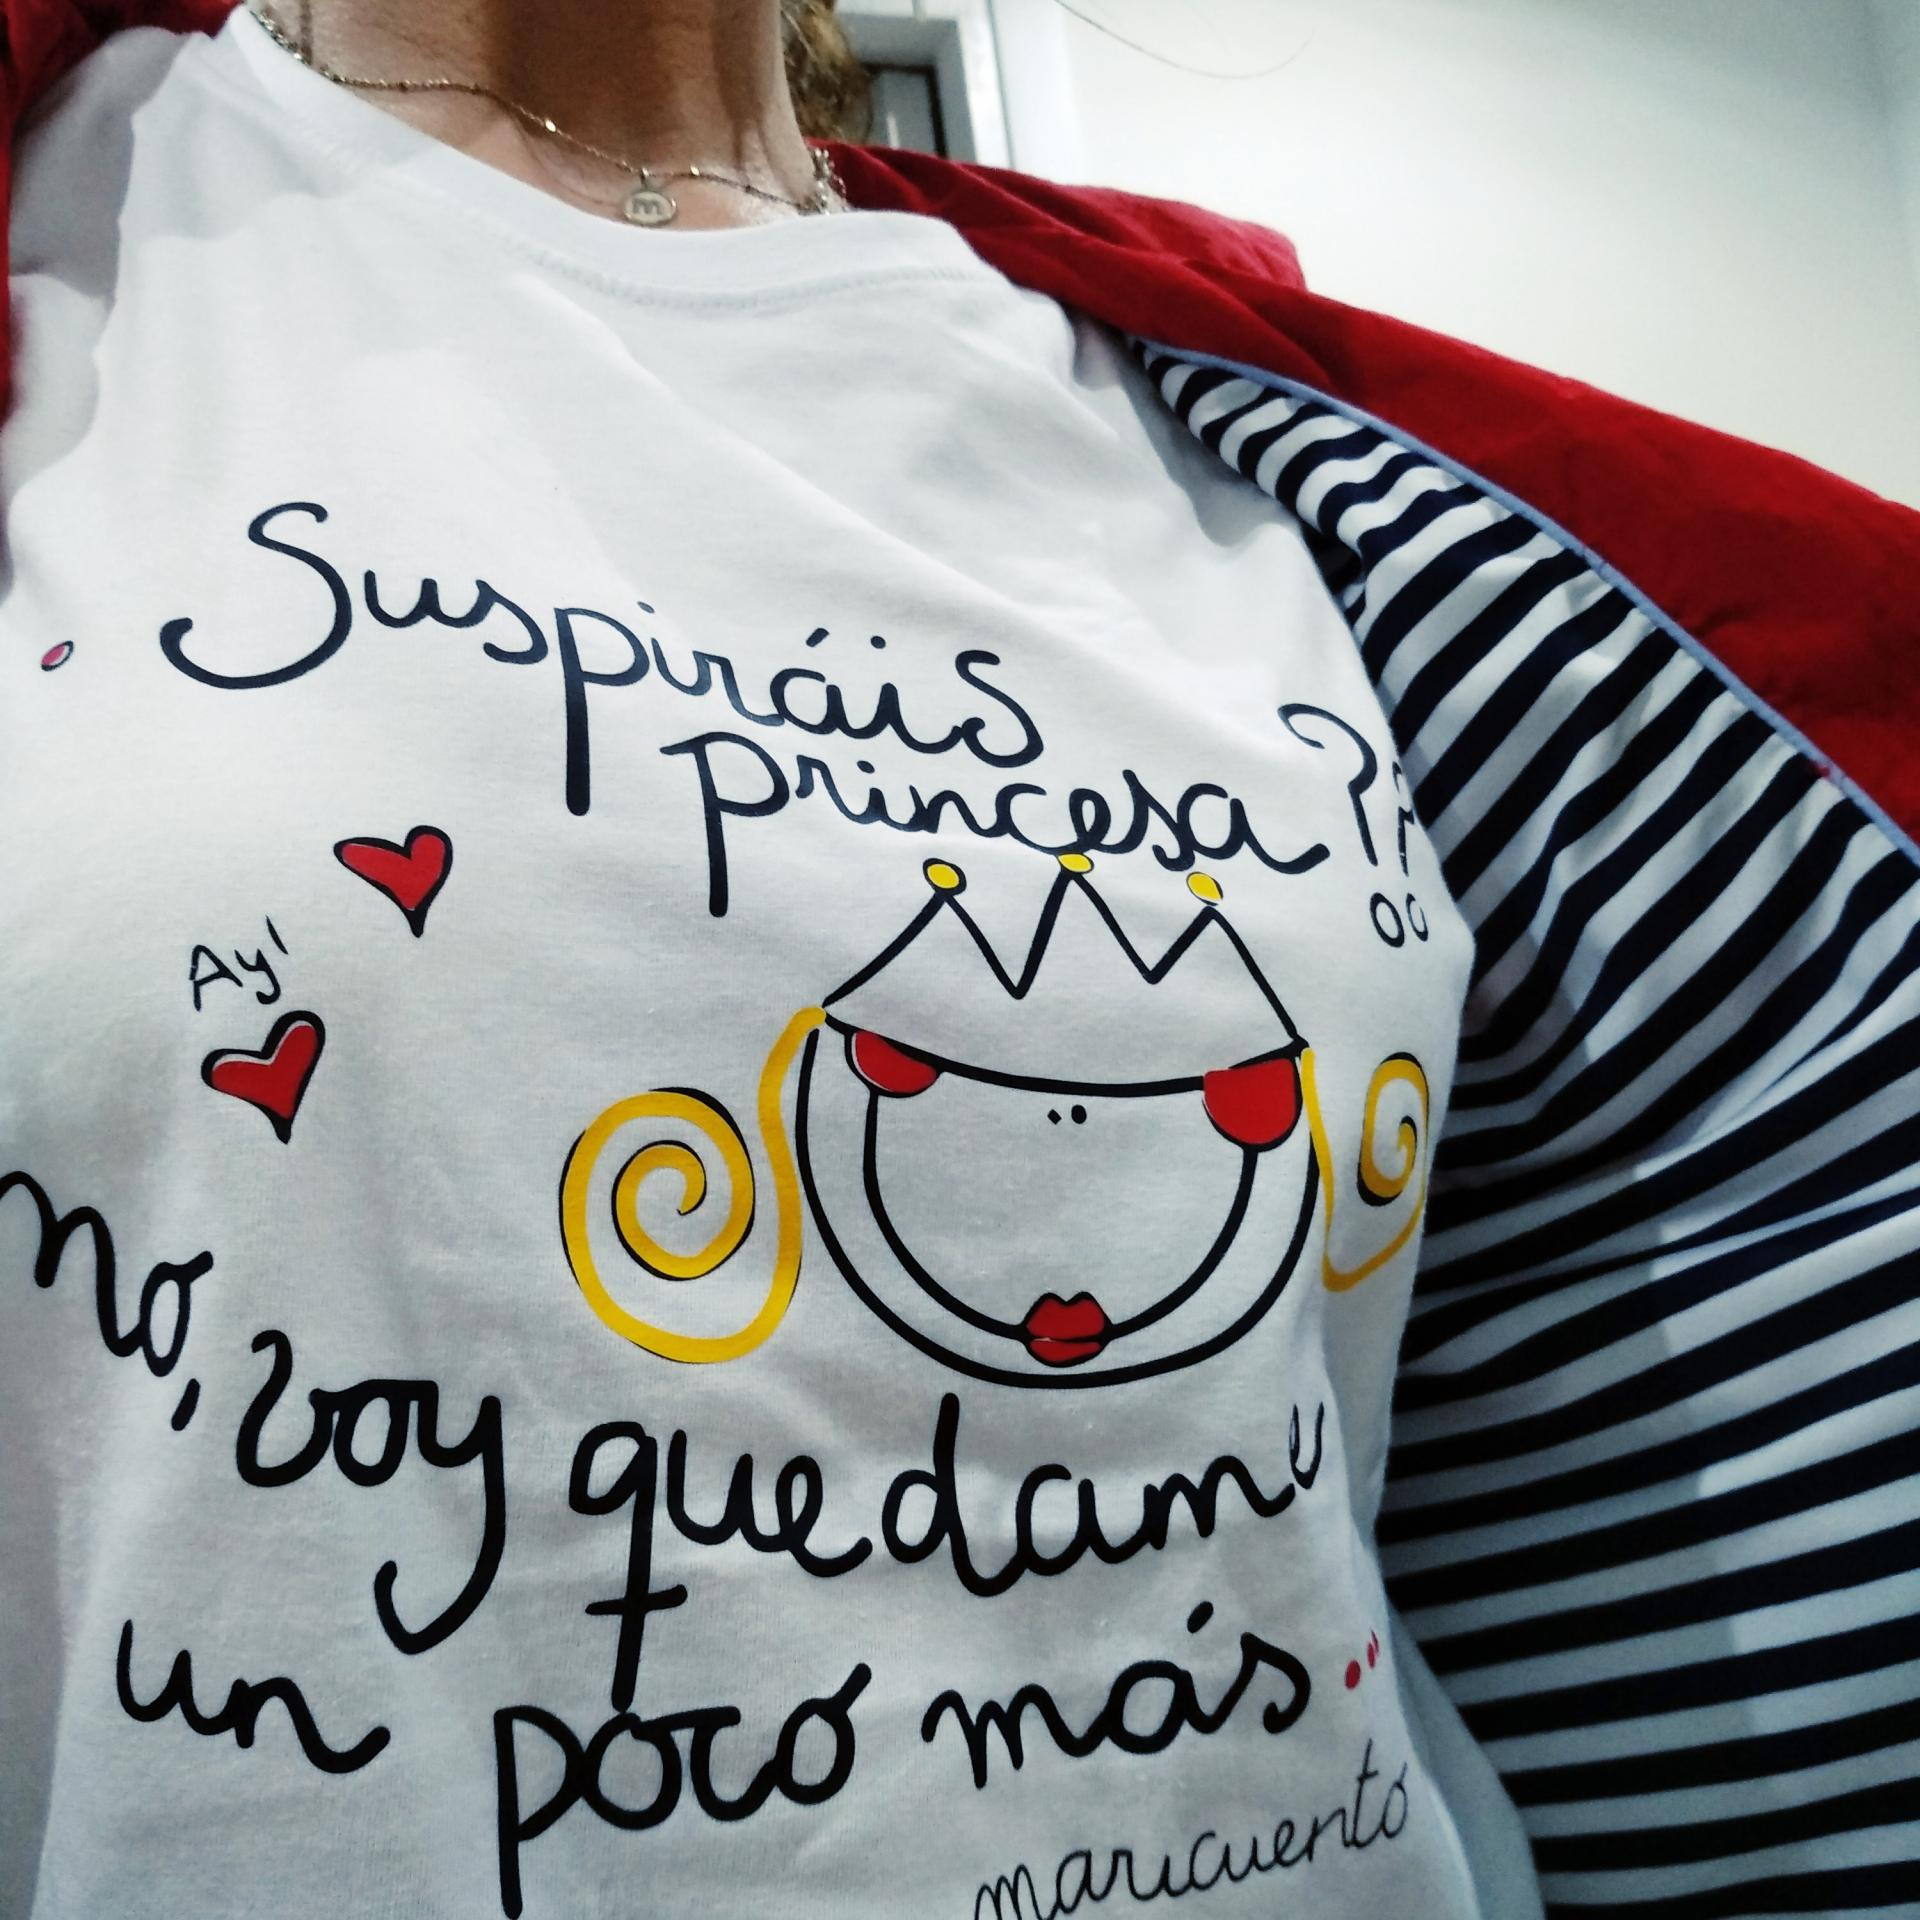 Camiseta Suspiráis princesa